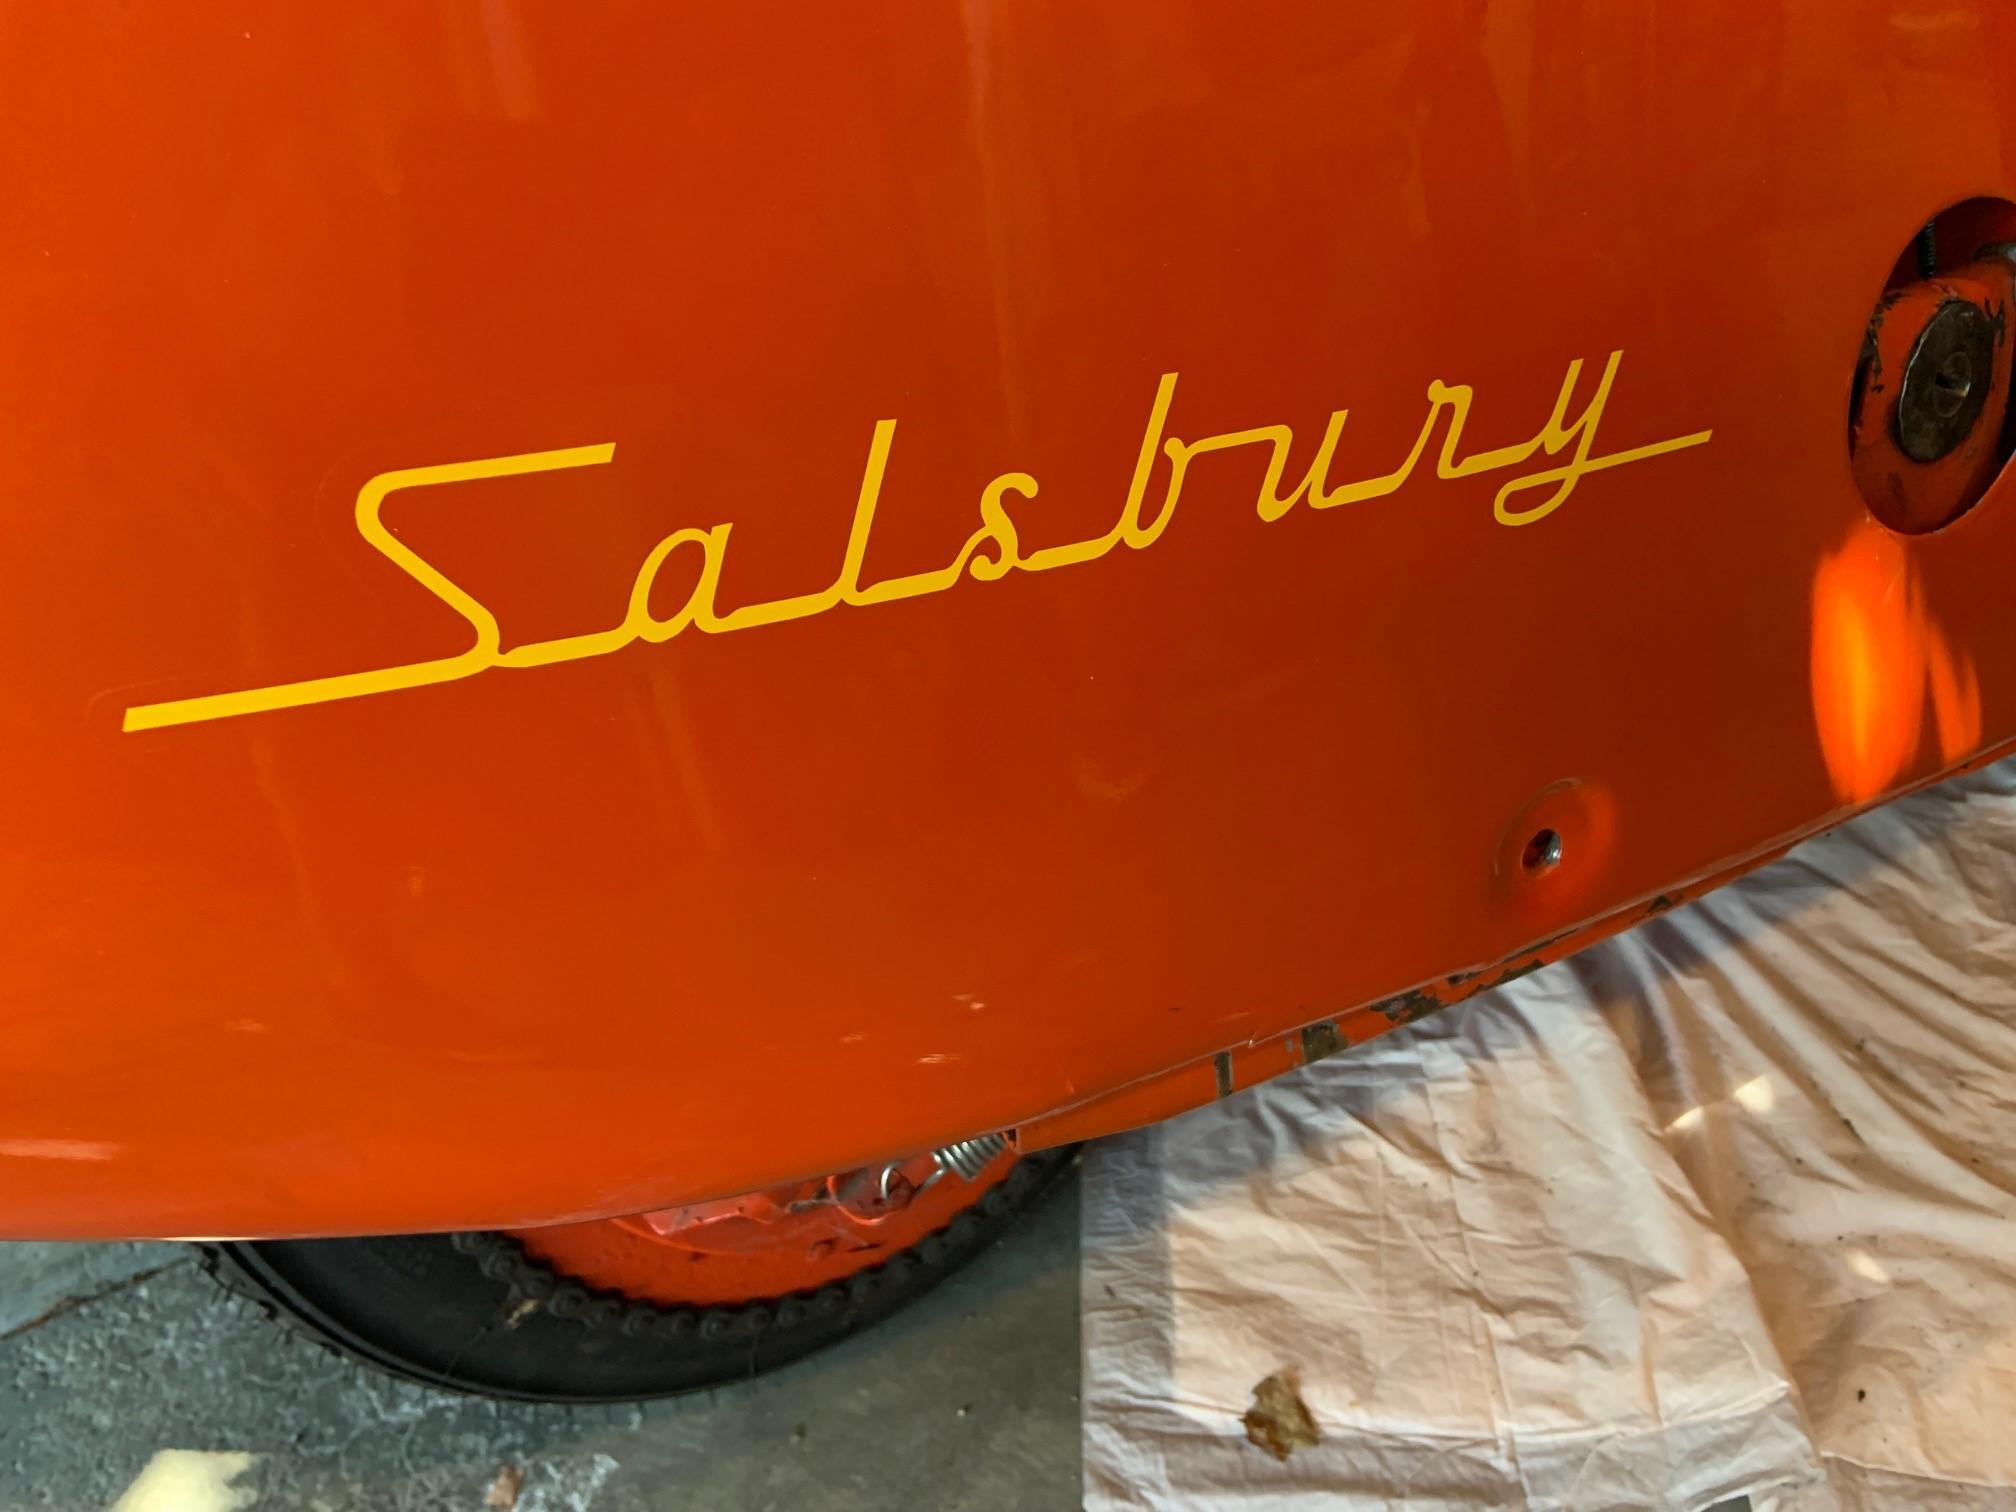 Josh Rogers - 1947 Salsbury - close up rear